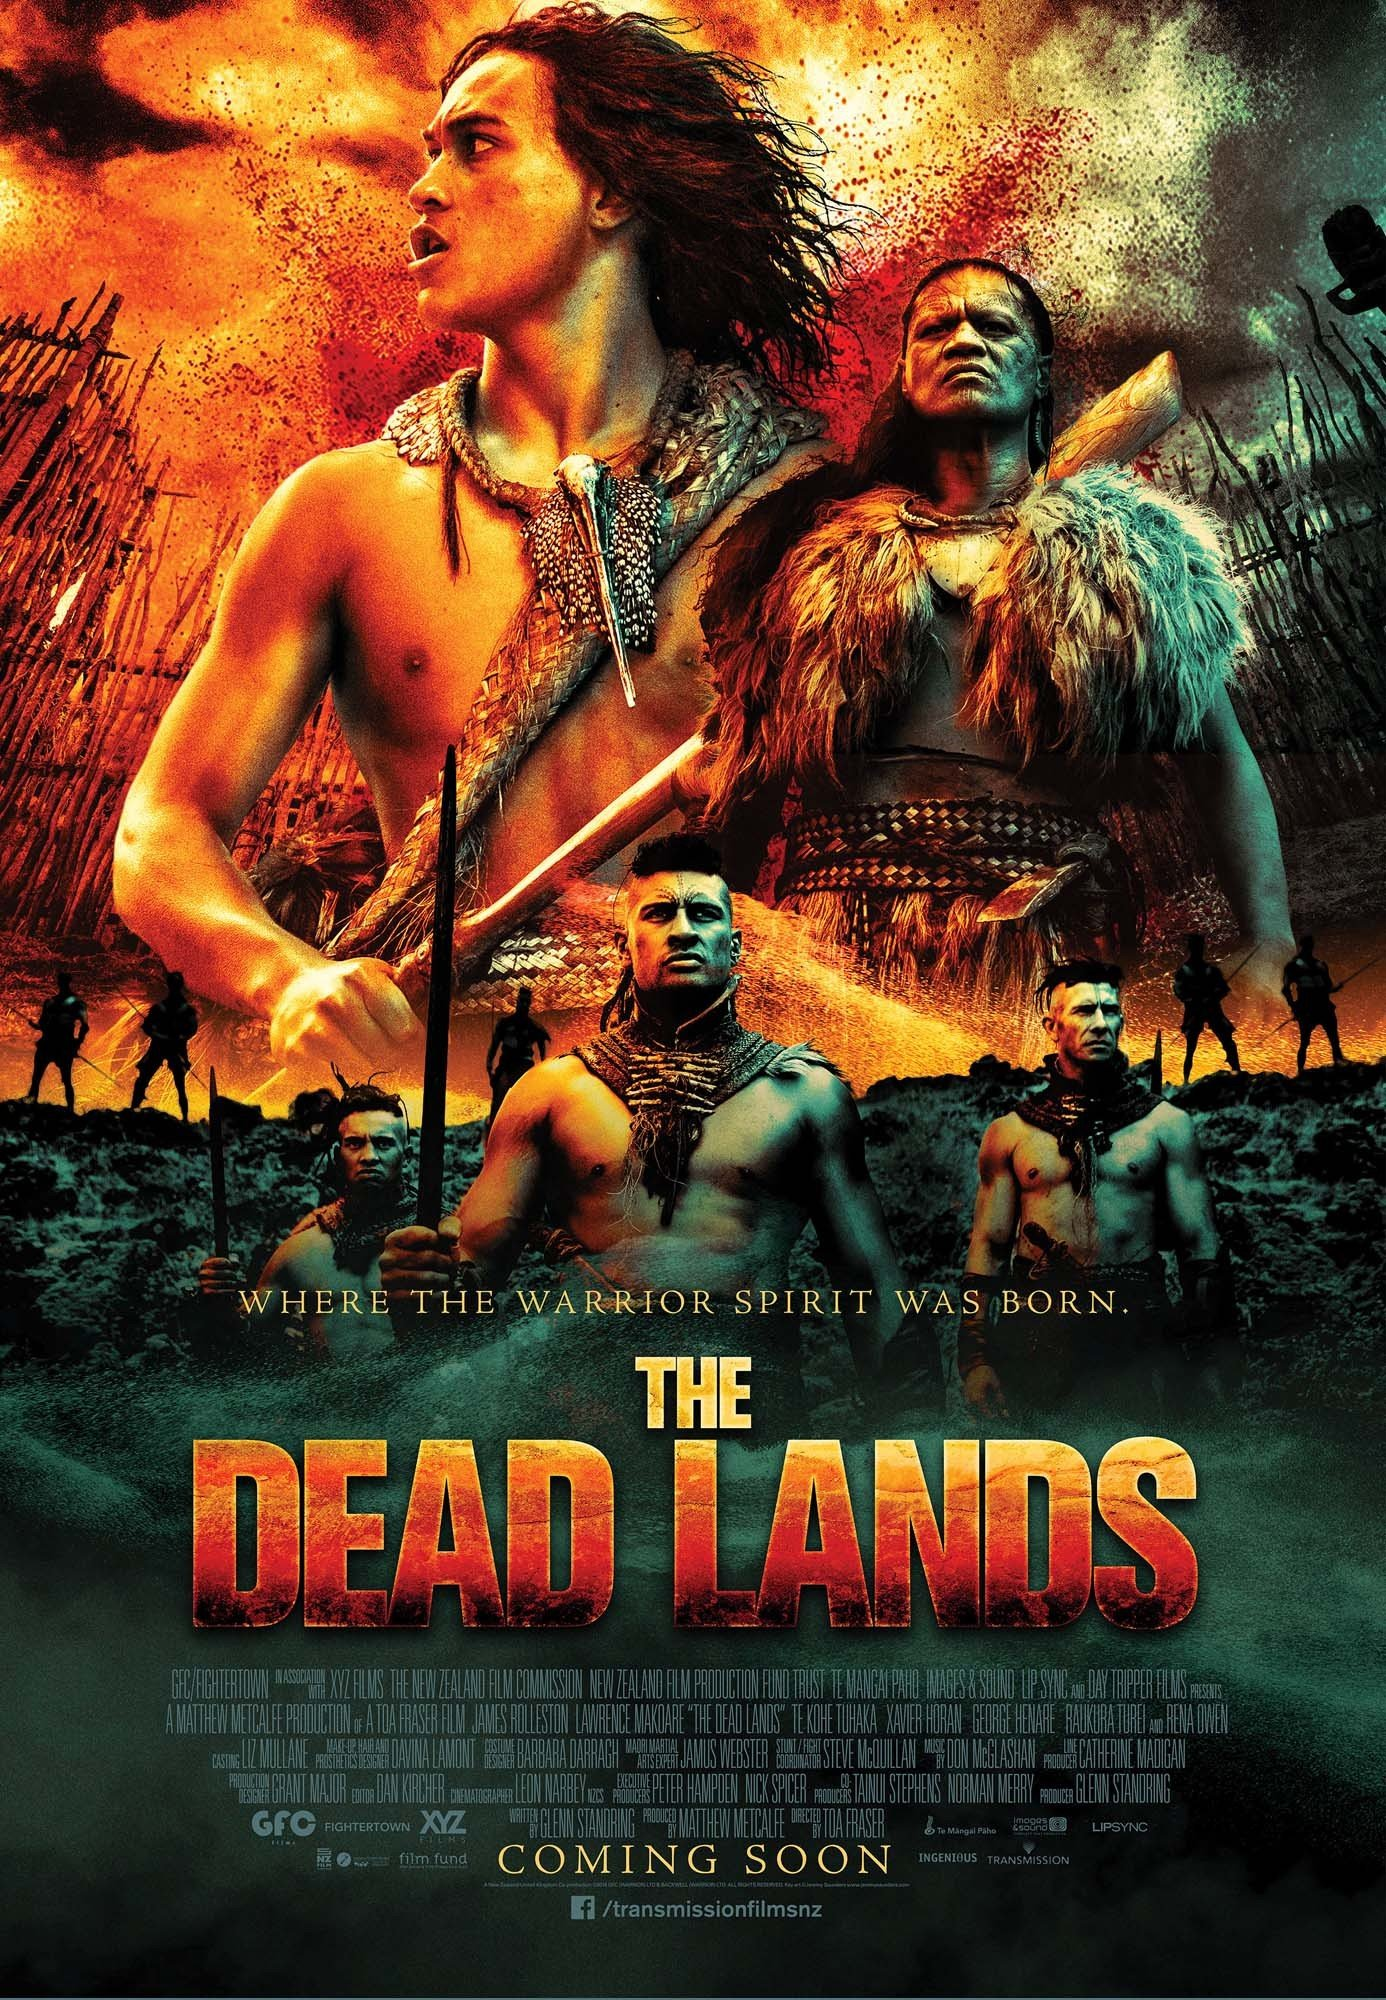 Apocalypto 2 Sub Indo : apocalypto, Apocalypto, Movie, Dubbed, Silentfasr